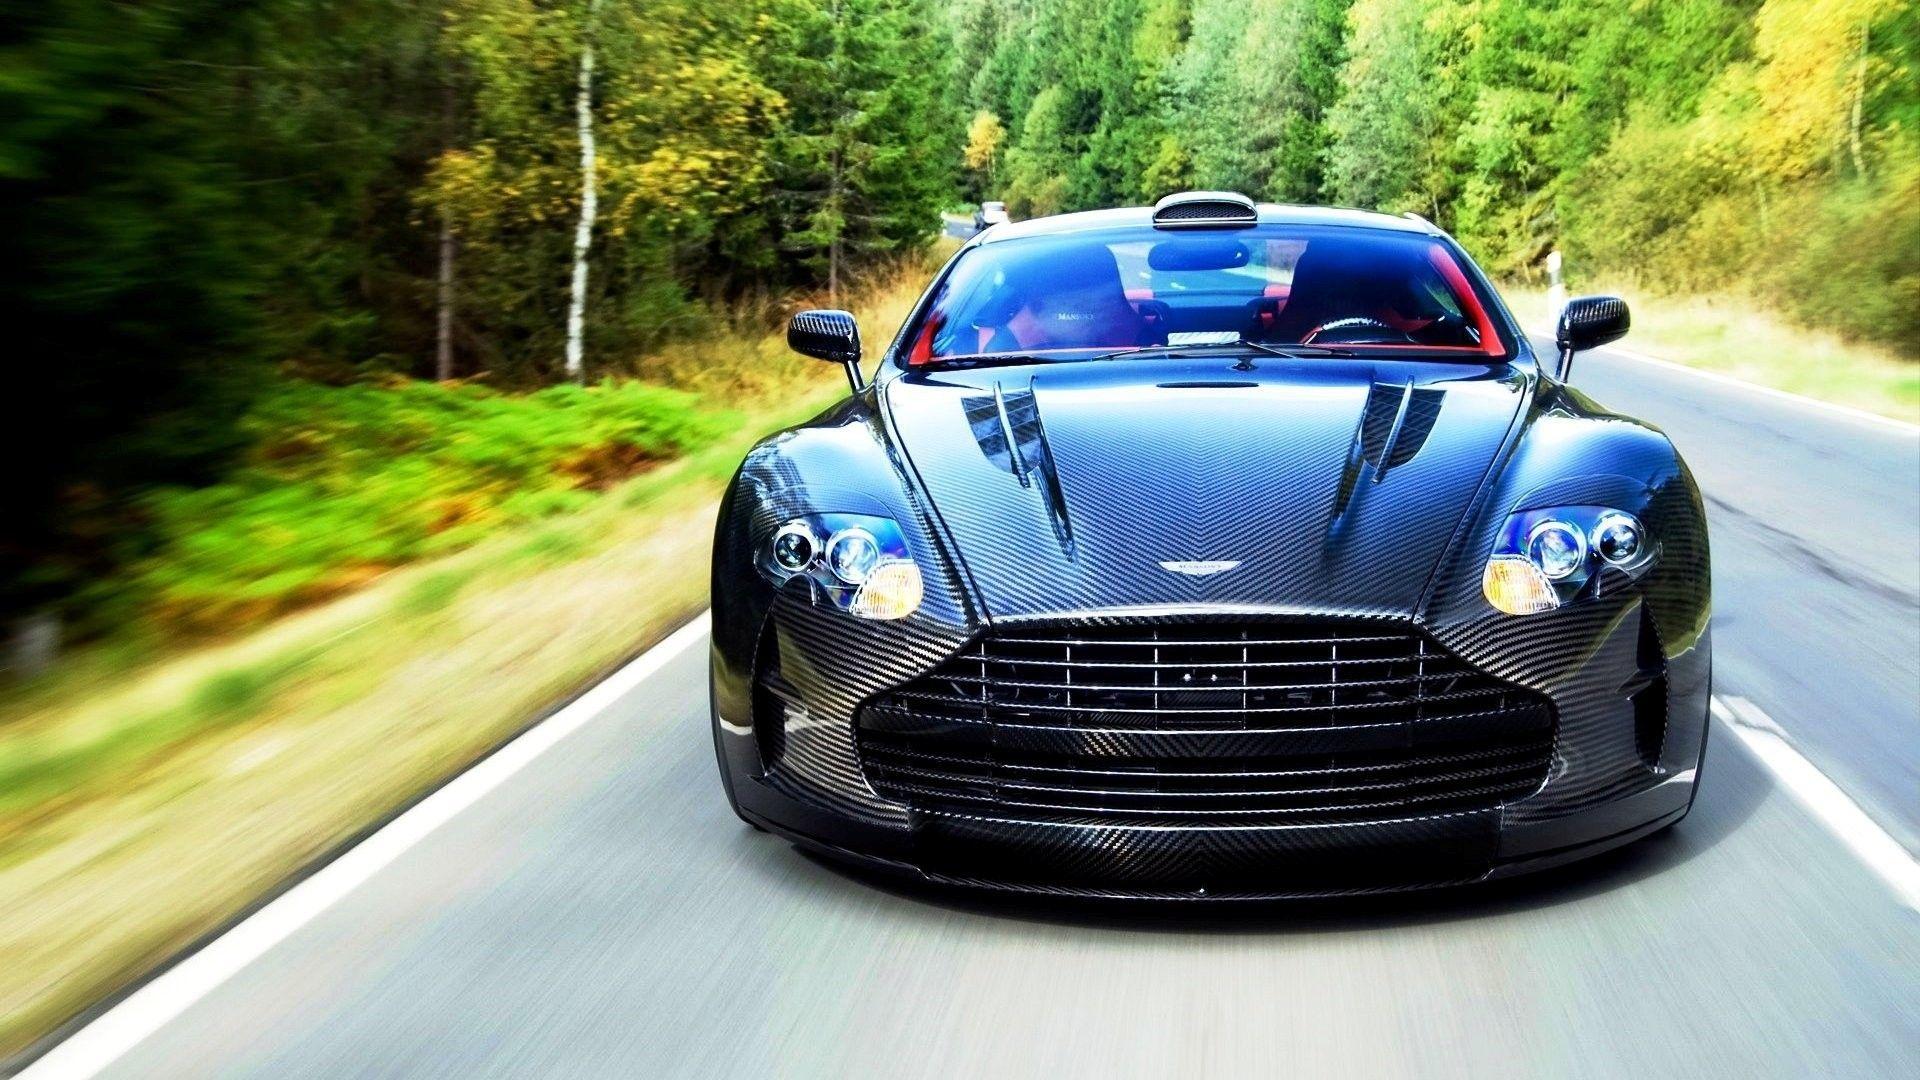 Aston Martin Wallpaper No 181471 Aston Martin Aston Martin Dbs Sport Cars